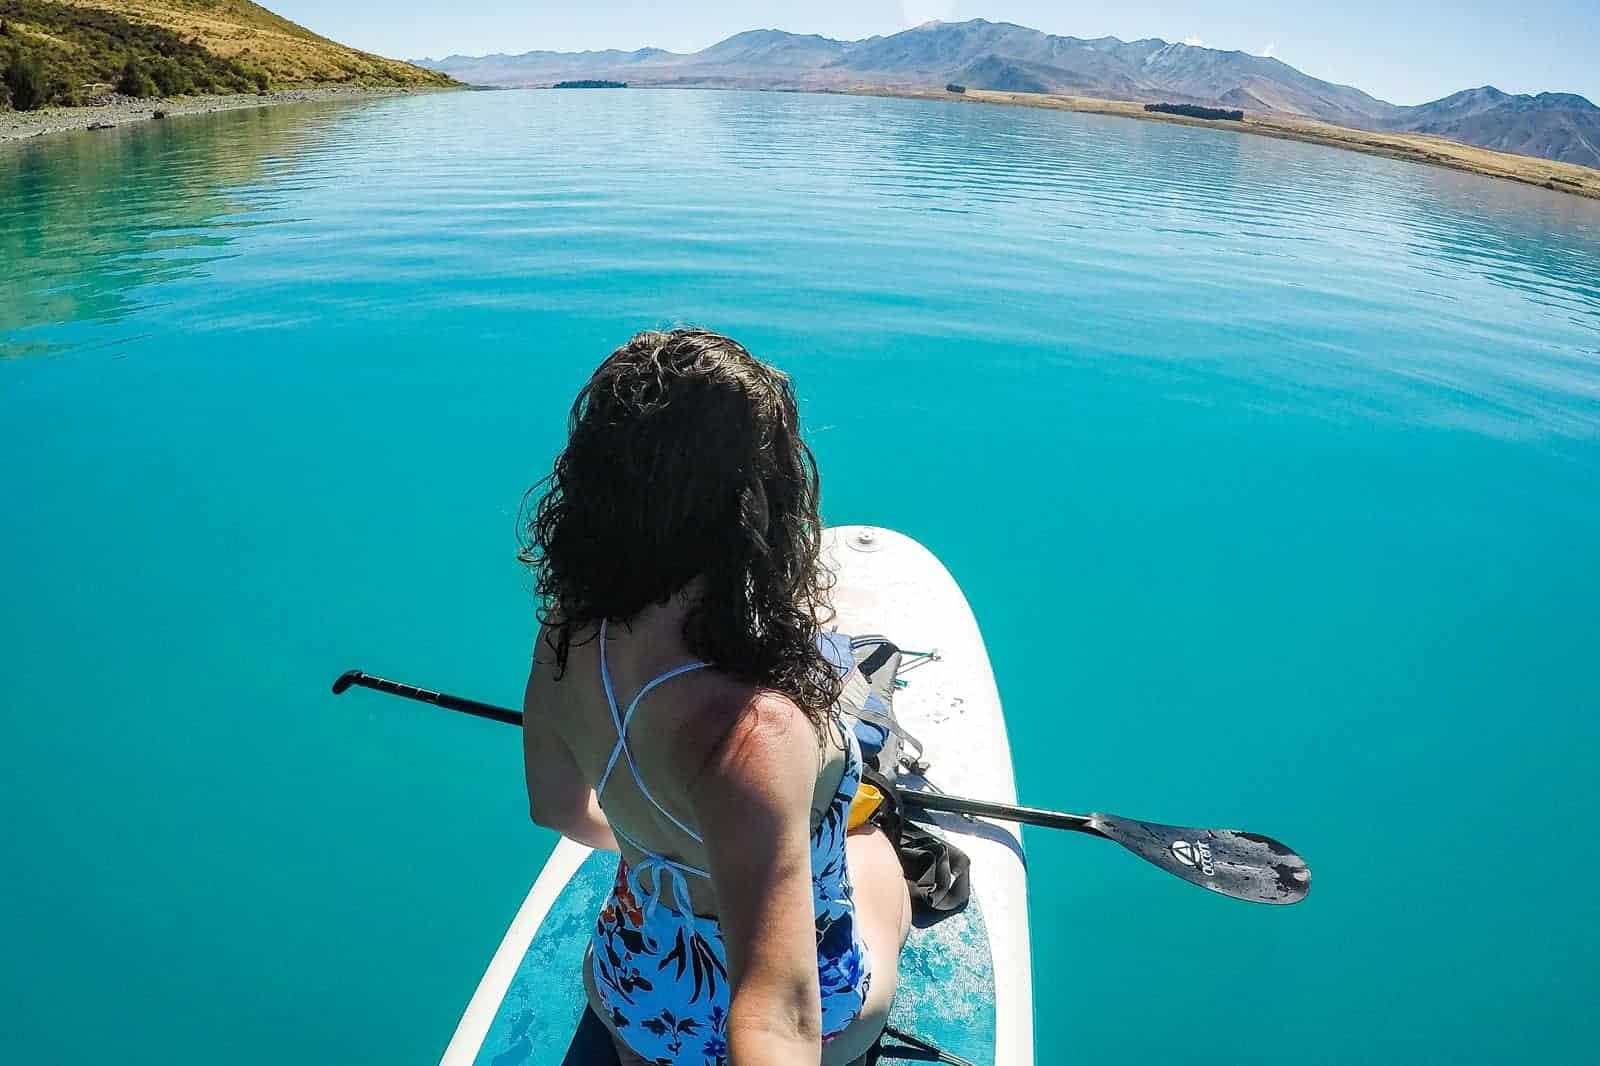 SUP at Lake Tekapo